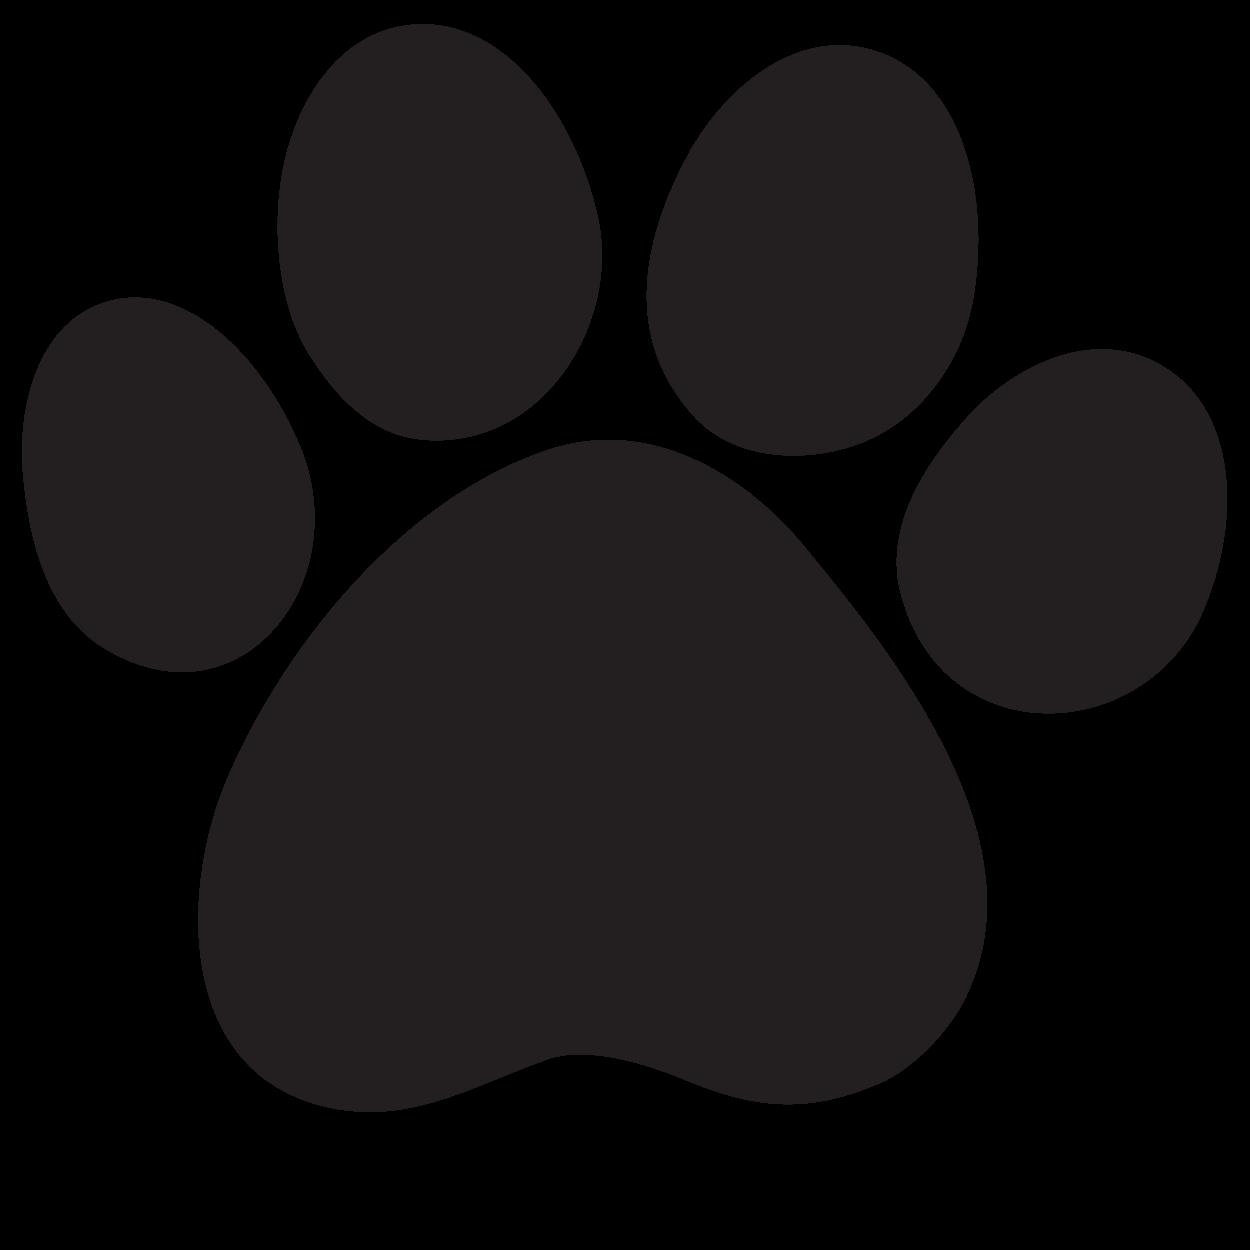 Jaguar paw print group. Pawprint clipart cheetah